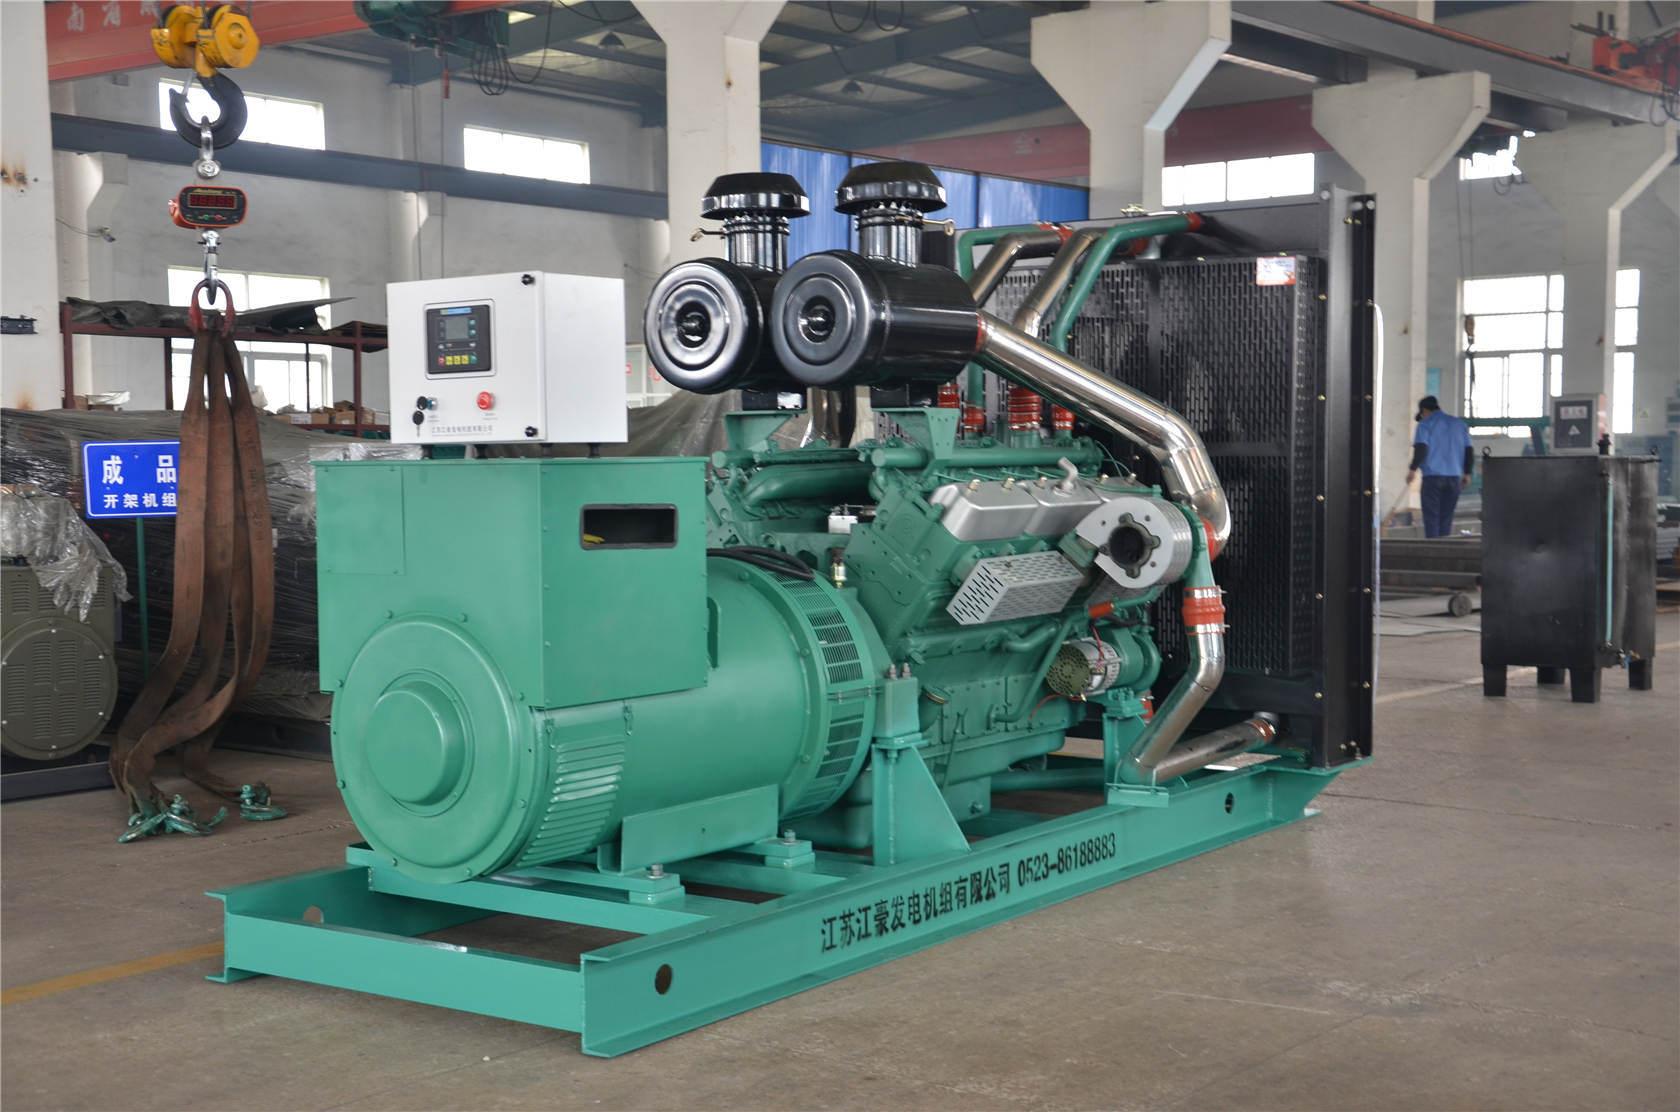 China Power Generator with Cummins Engine - China Generator, Diesel  Generator Set